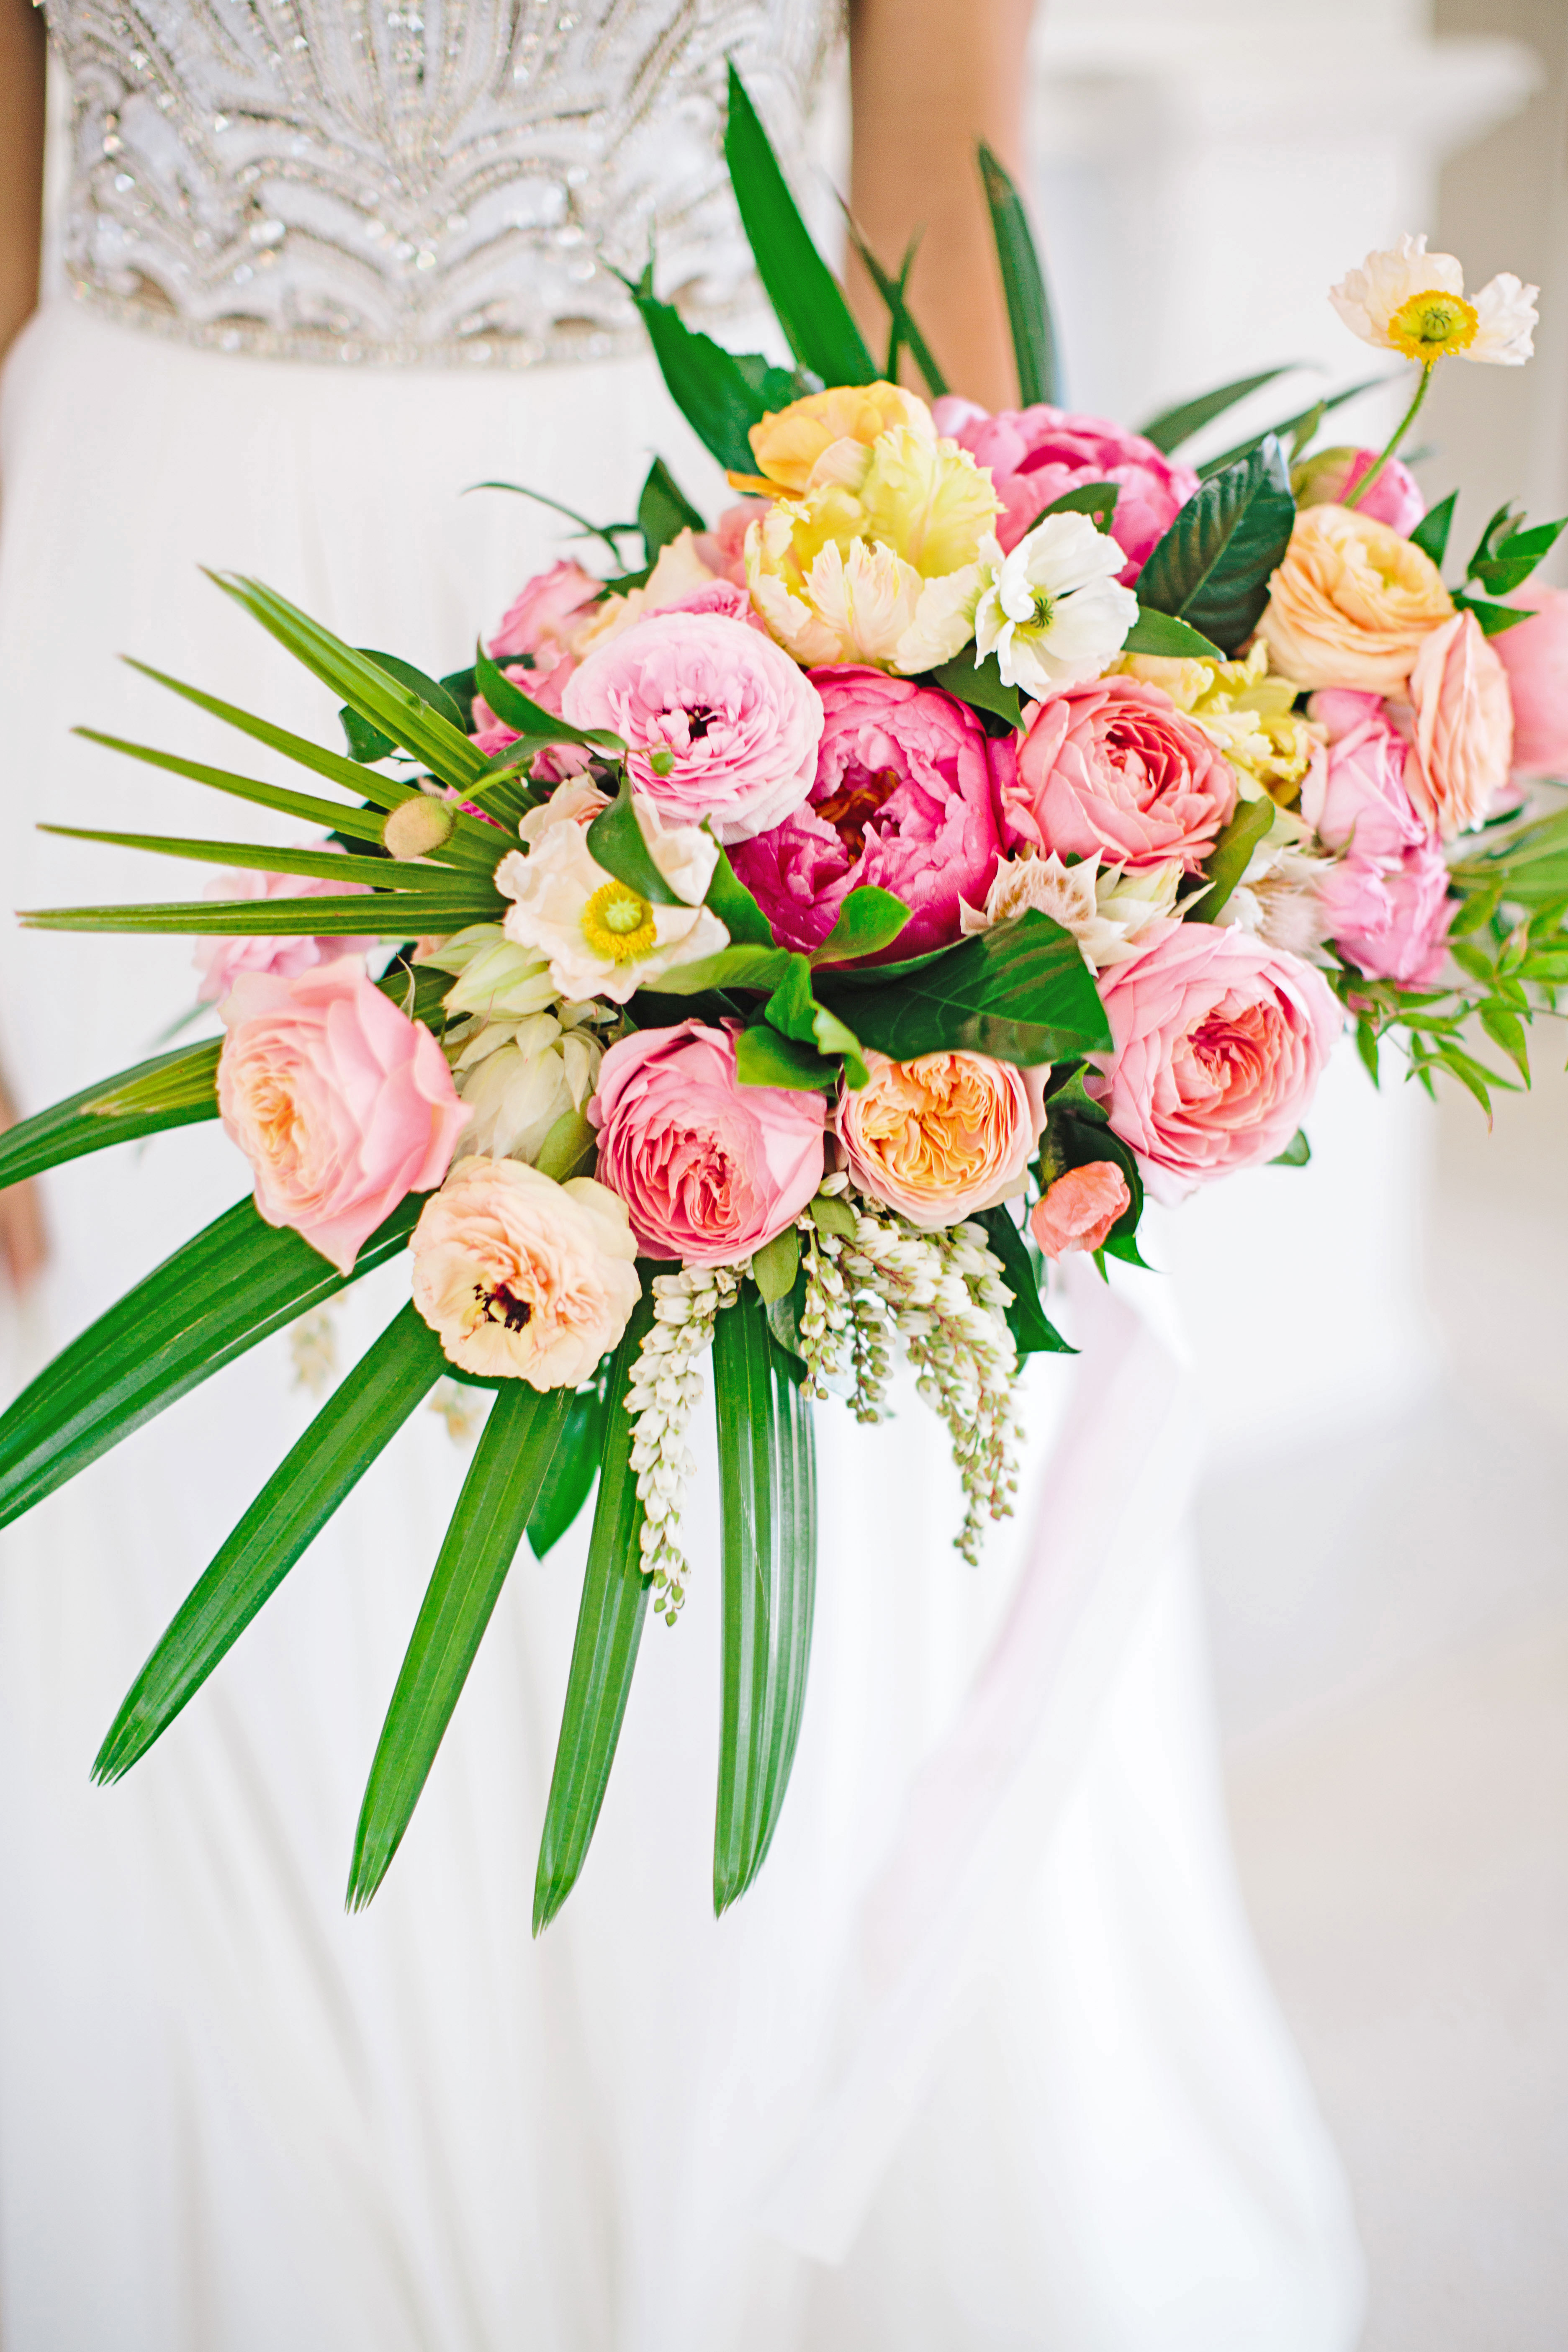 stephanie jared wedding bouquet